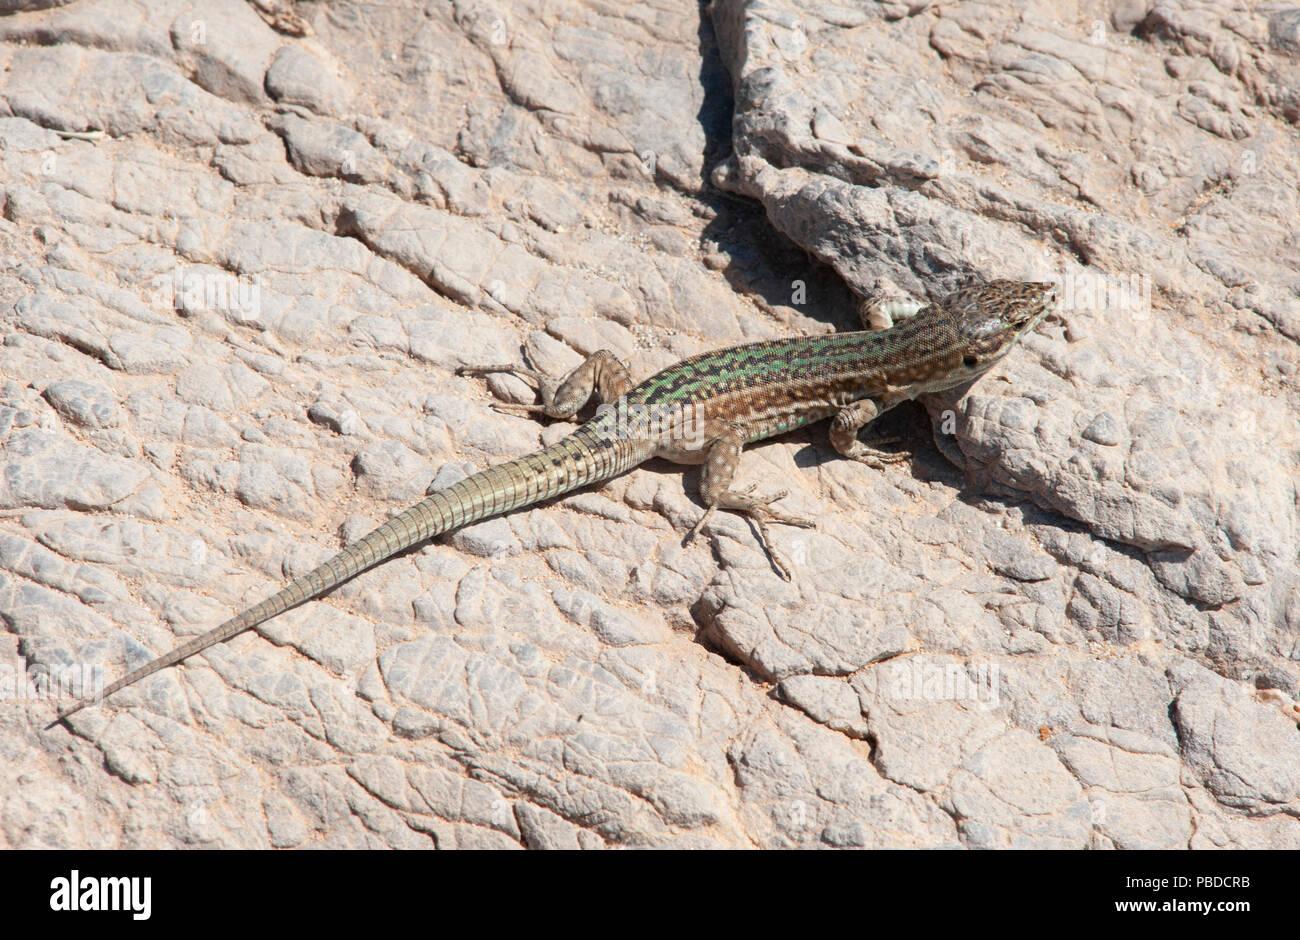 Ibiza Wall Lizard, (Podarcis pityusensis), on rocks on the east coast of Ibiza Island, Balearic Islands, Mediterranean Sea, Spain Stock Photo